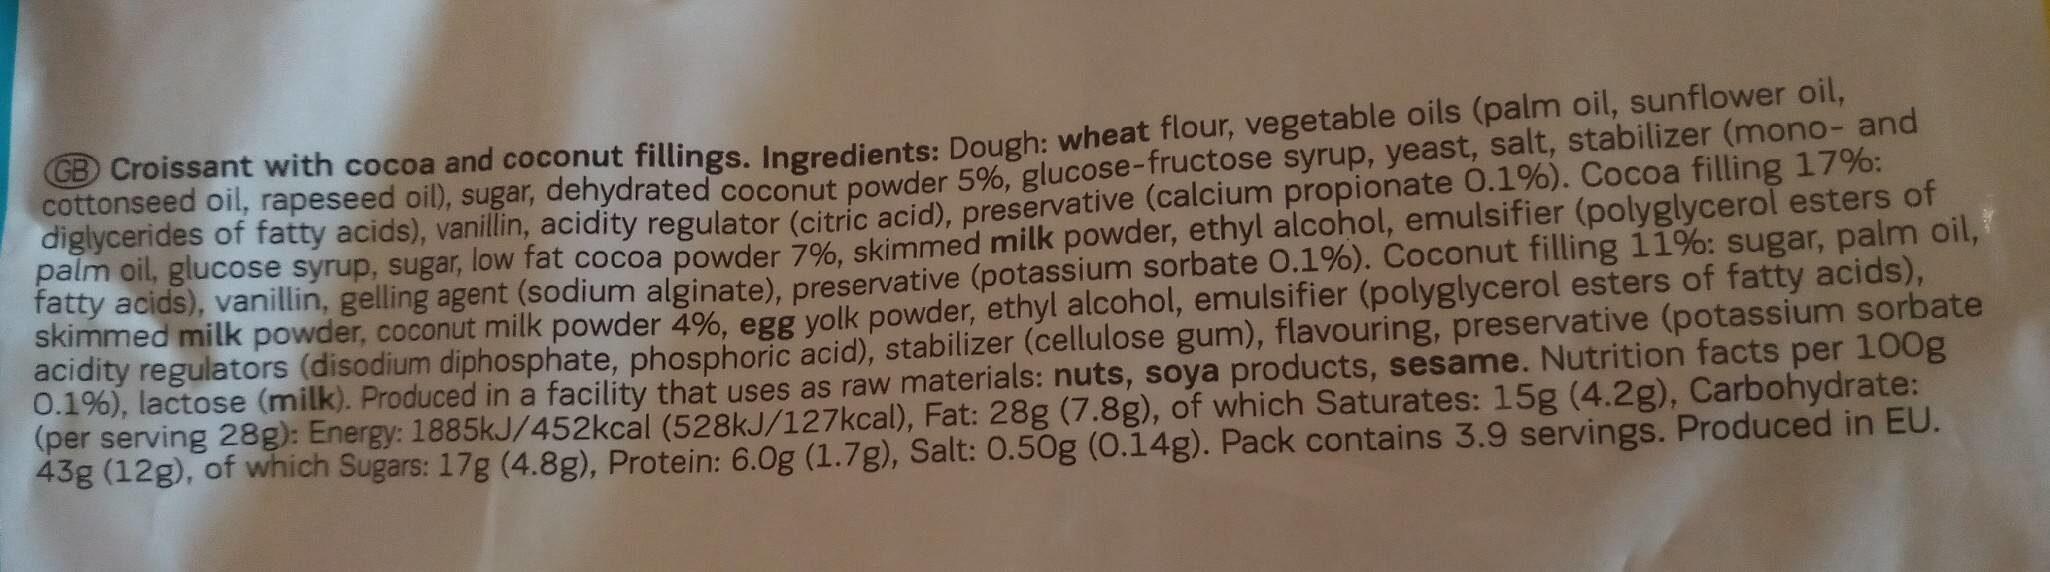 Double coconut - Хранителна информация - en